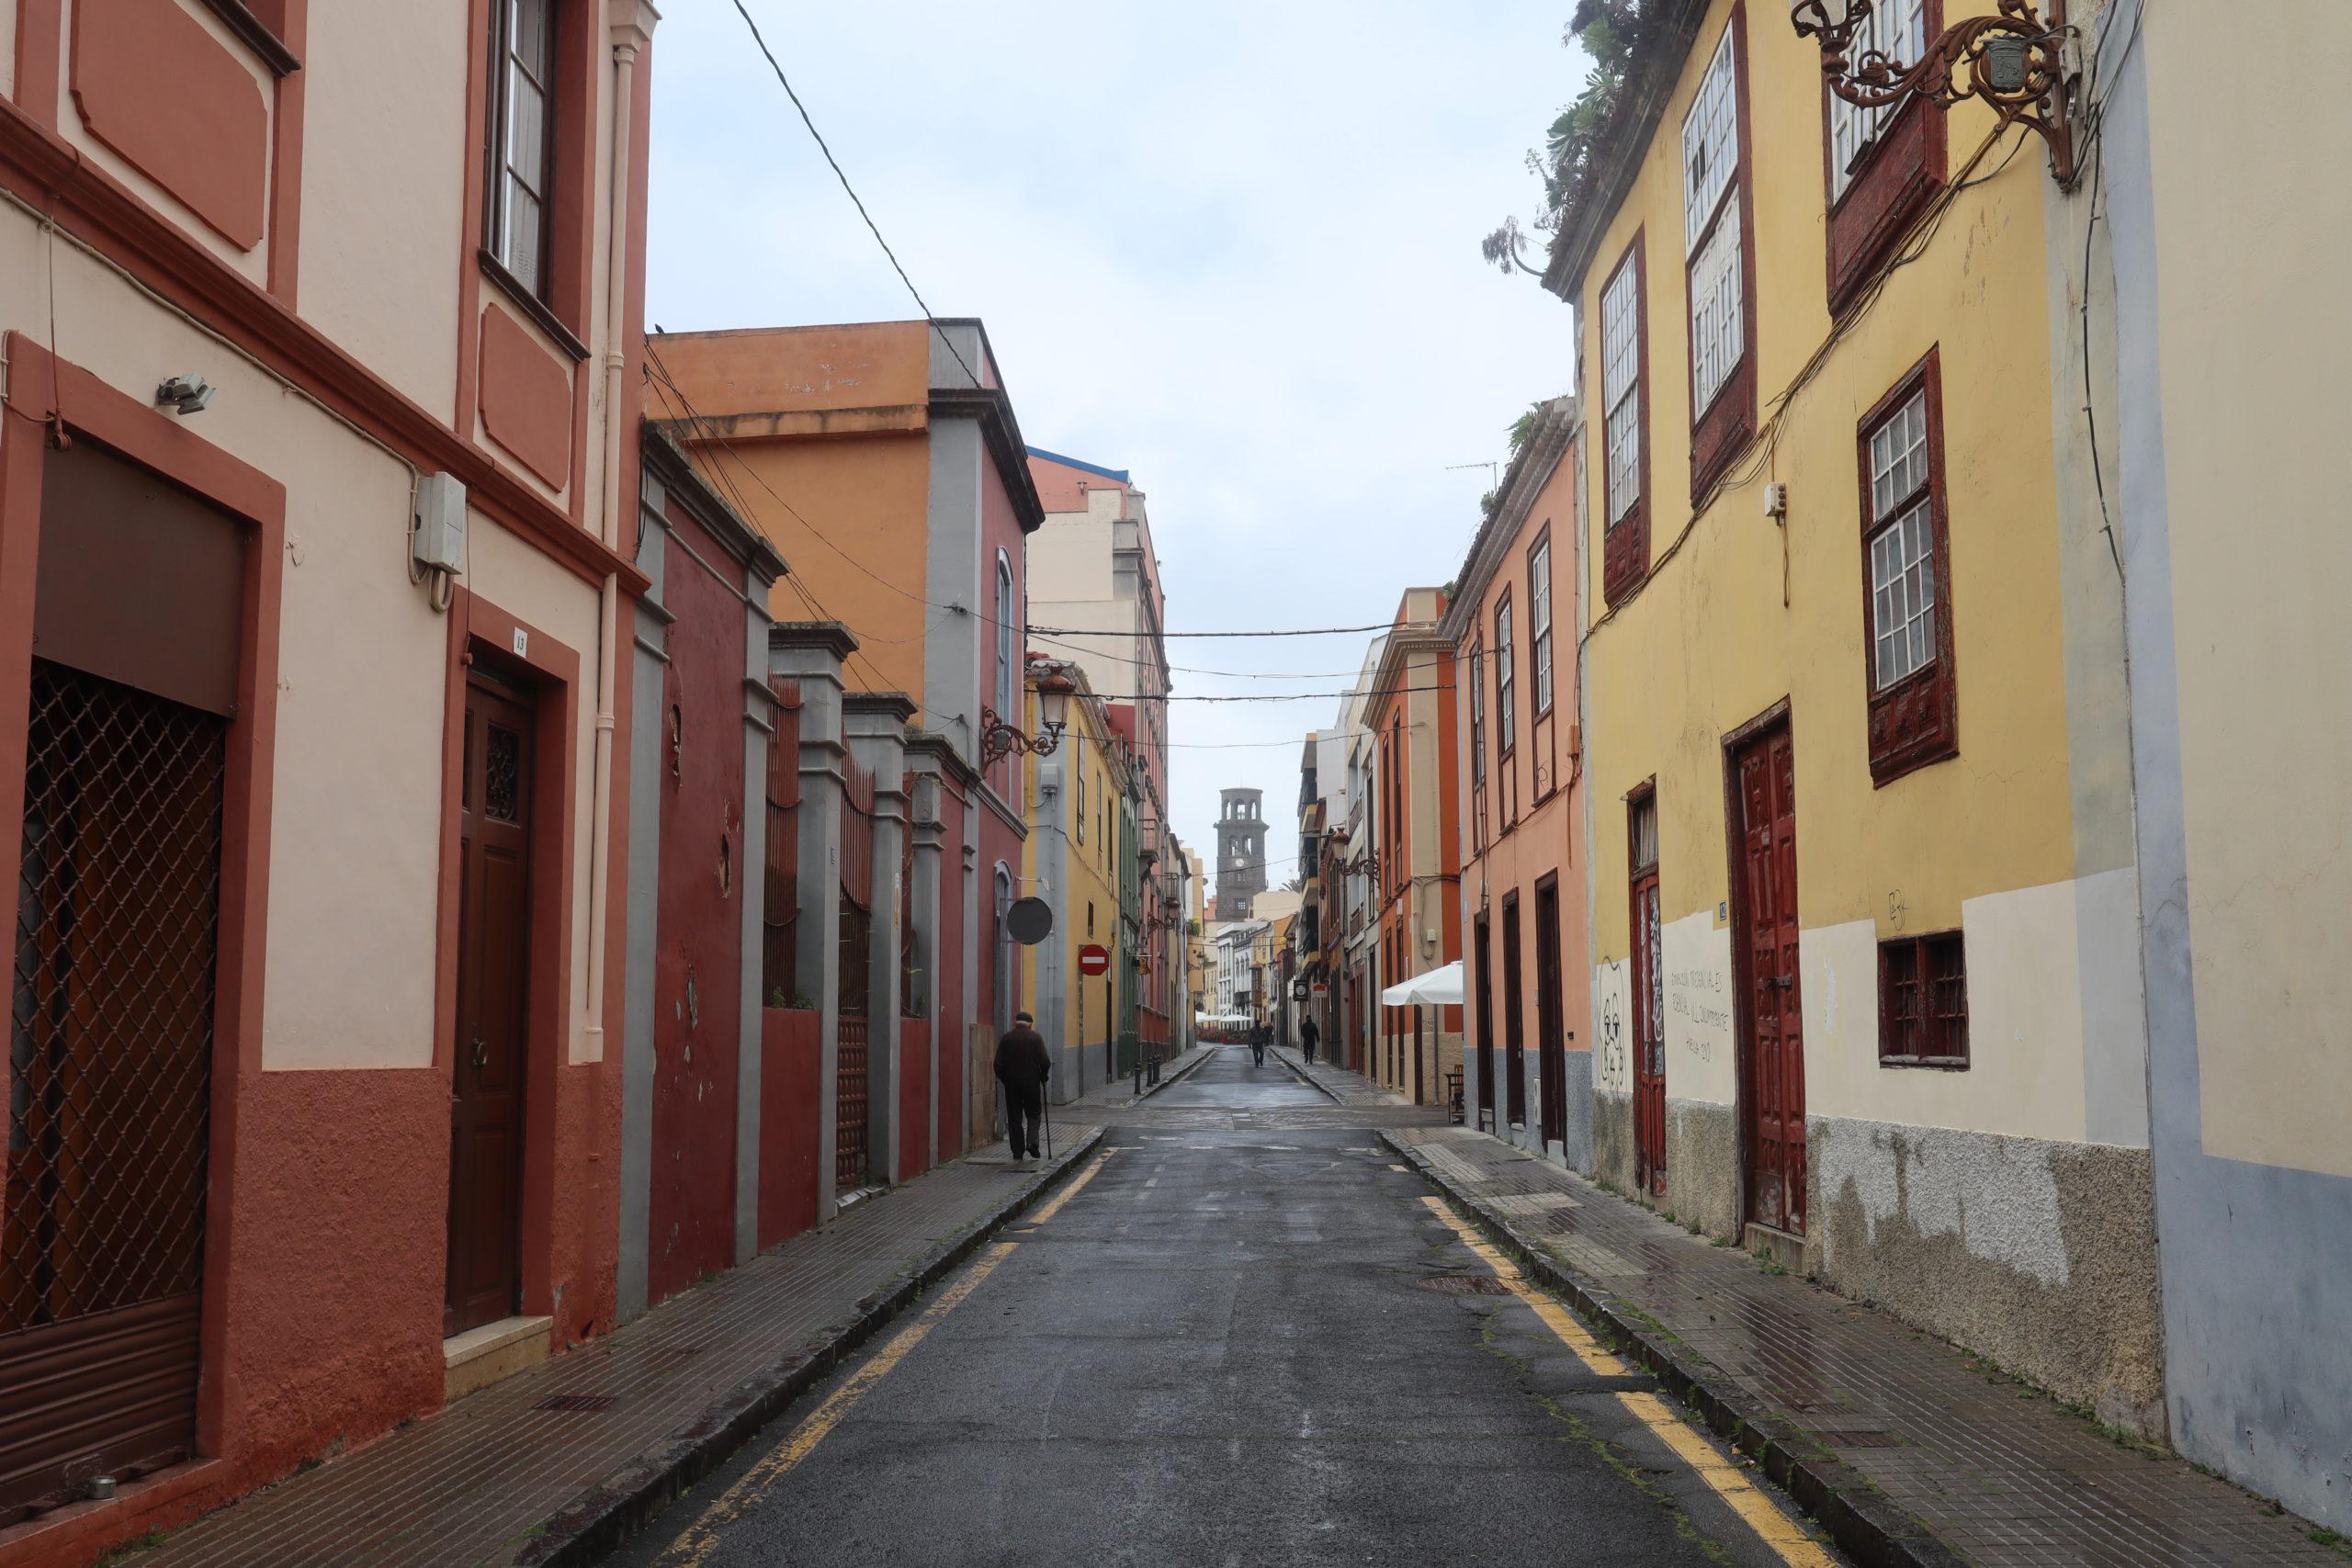 San-Cristóbal-la-laguna